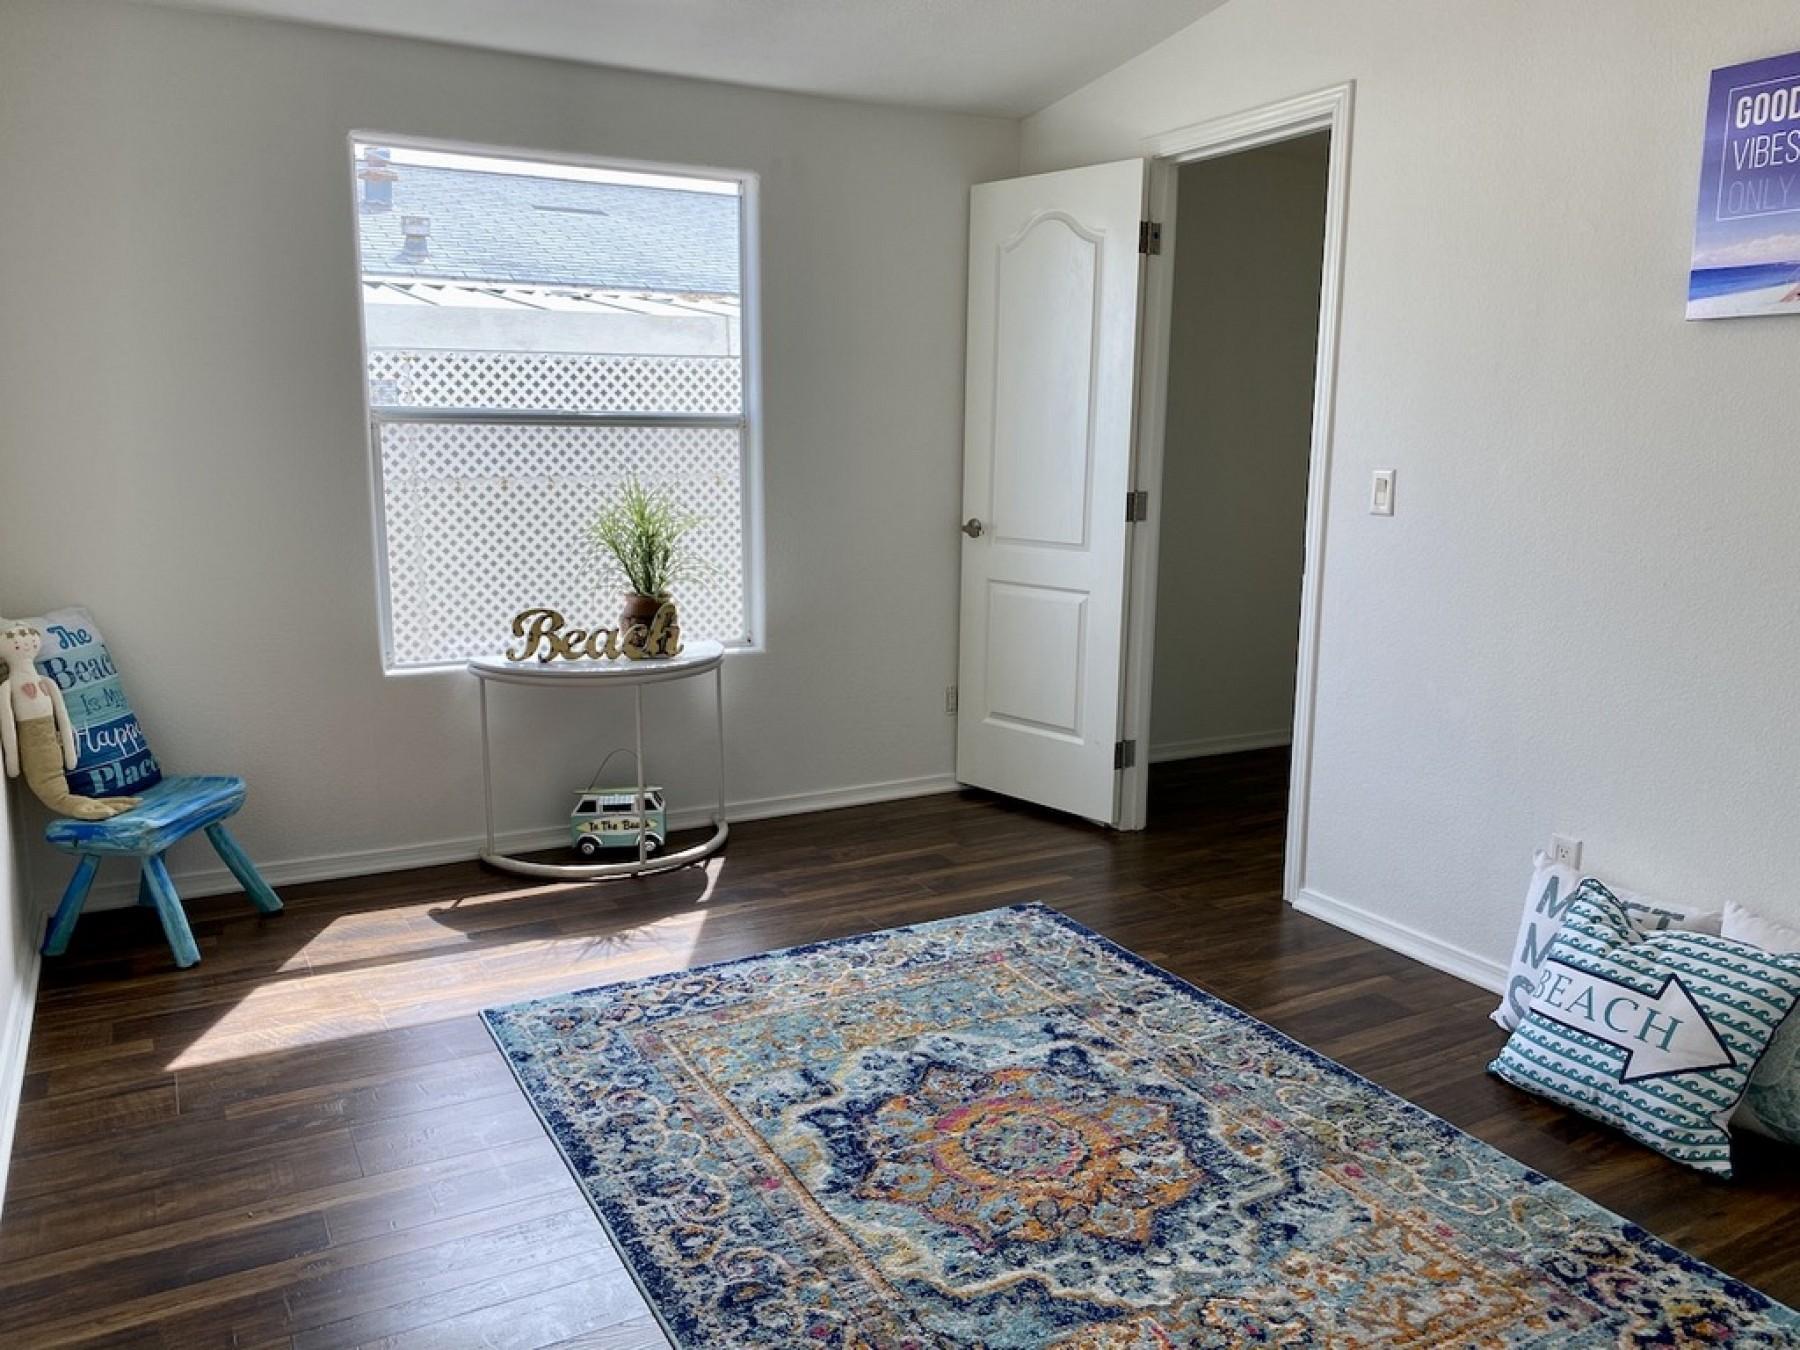 5540 W. 5th Street, Space 135, Oxnard Shores, CA 93035